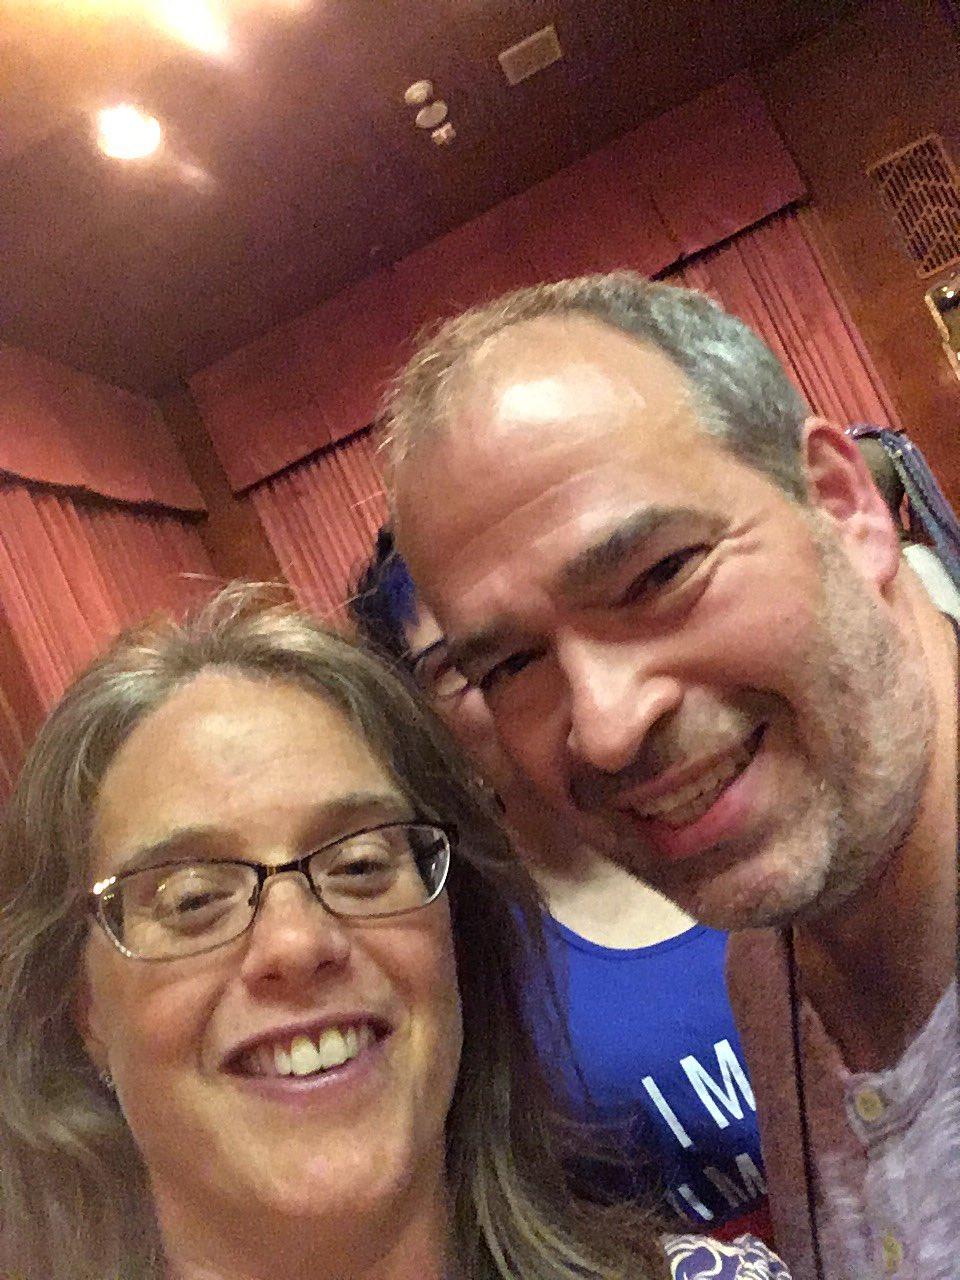 #StokerCon2017 selfie with @JohnUrbancik https://t.co/5erZZewmPf